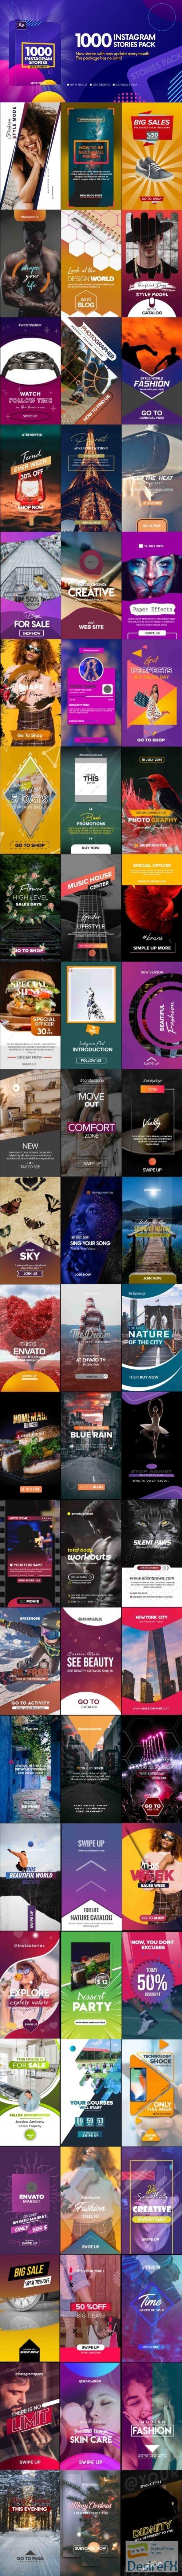 Videohive Instagram Stories V2 23458472